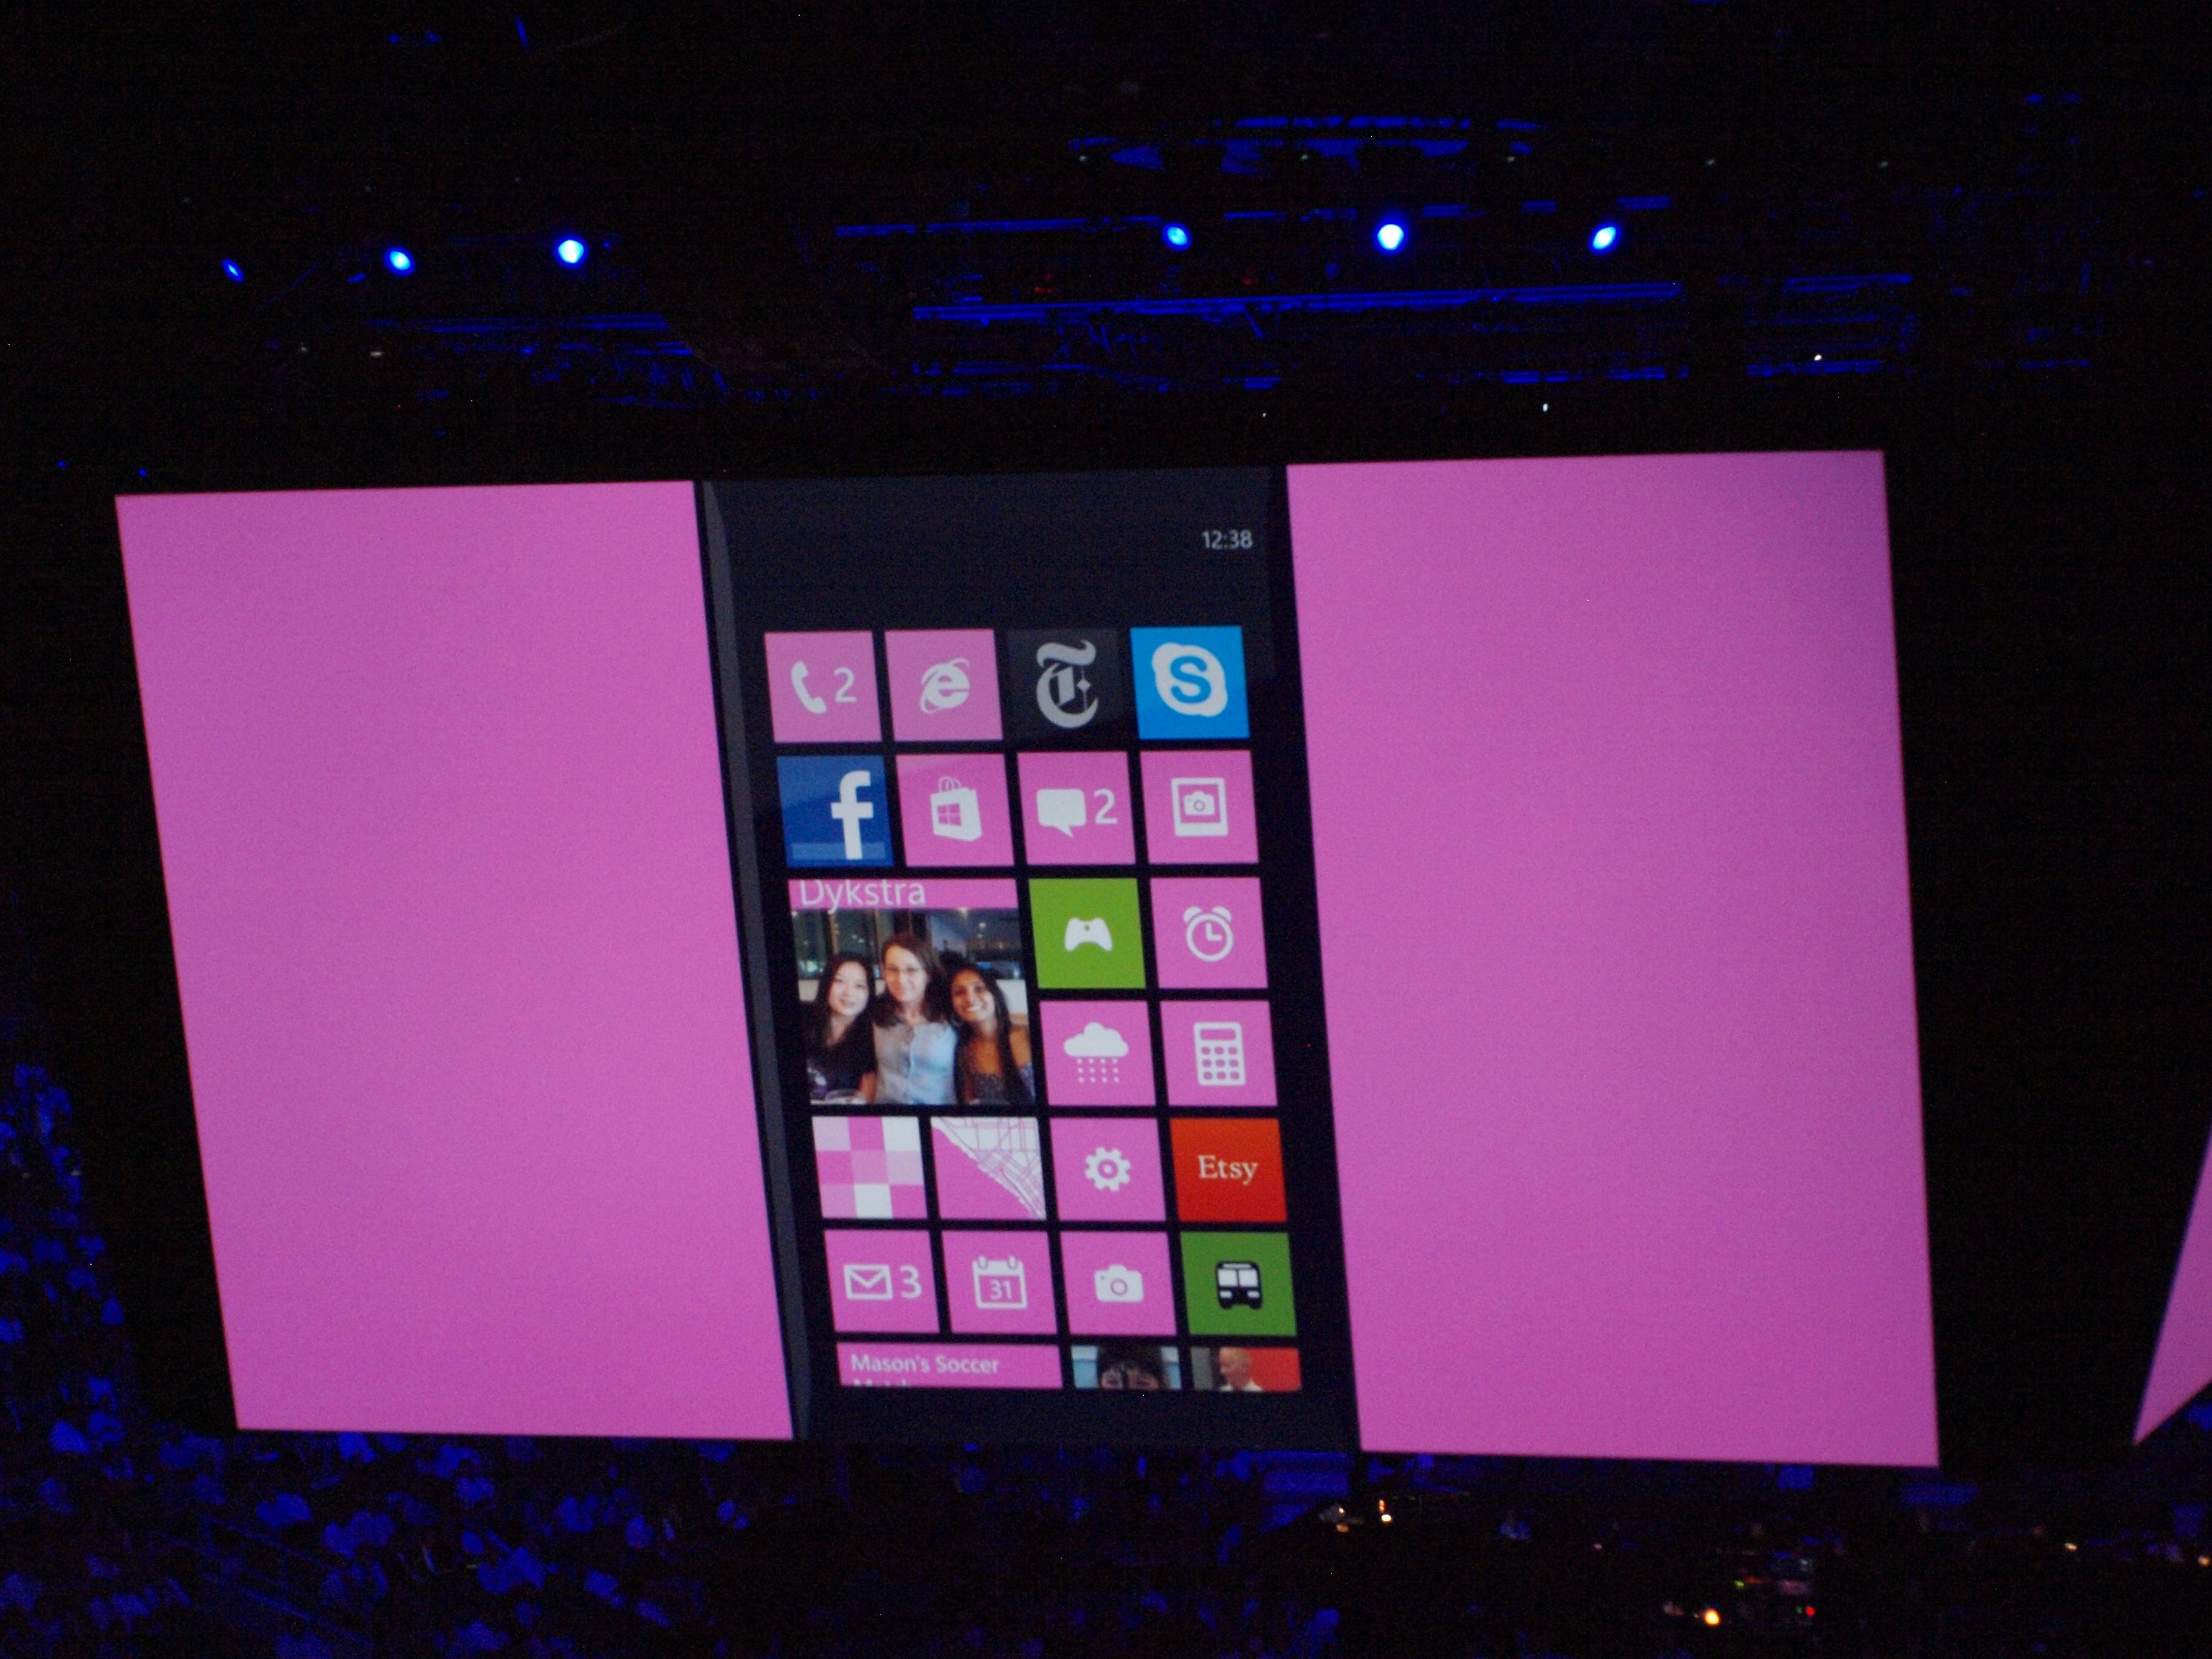 Windows Phone 8ではタイルの大きさをタッチひとつで自由に変えられる。到着したばかりのメッセージや写真を大きく表示させたいときなどにも便利。Windows 8とも完全互換